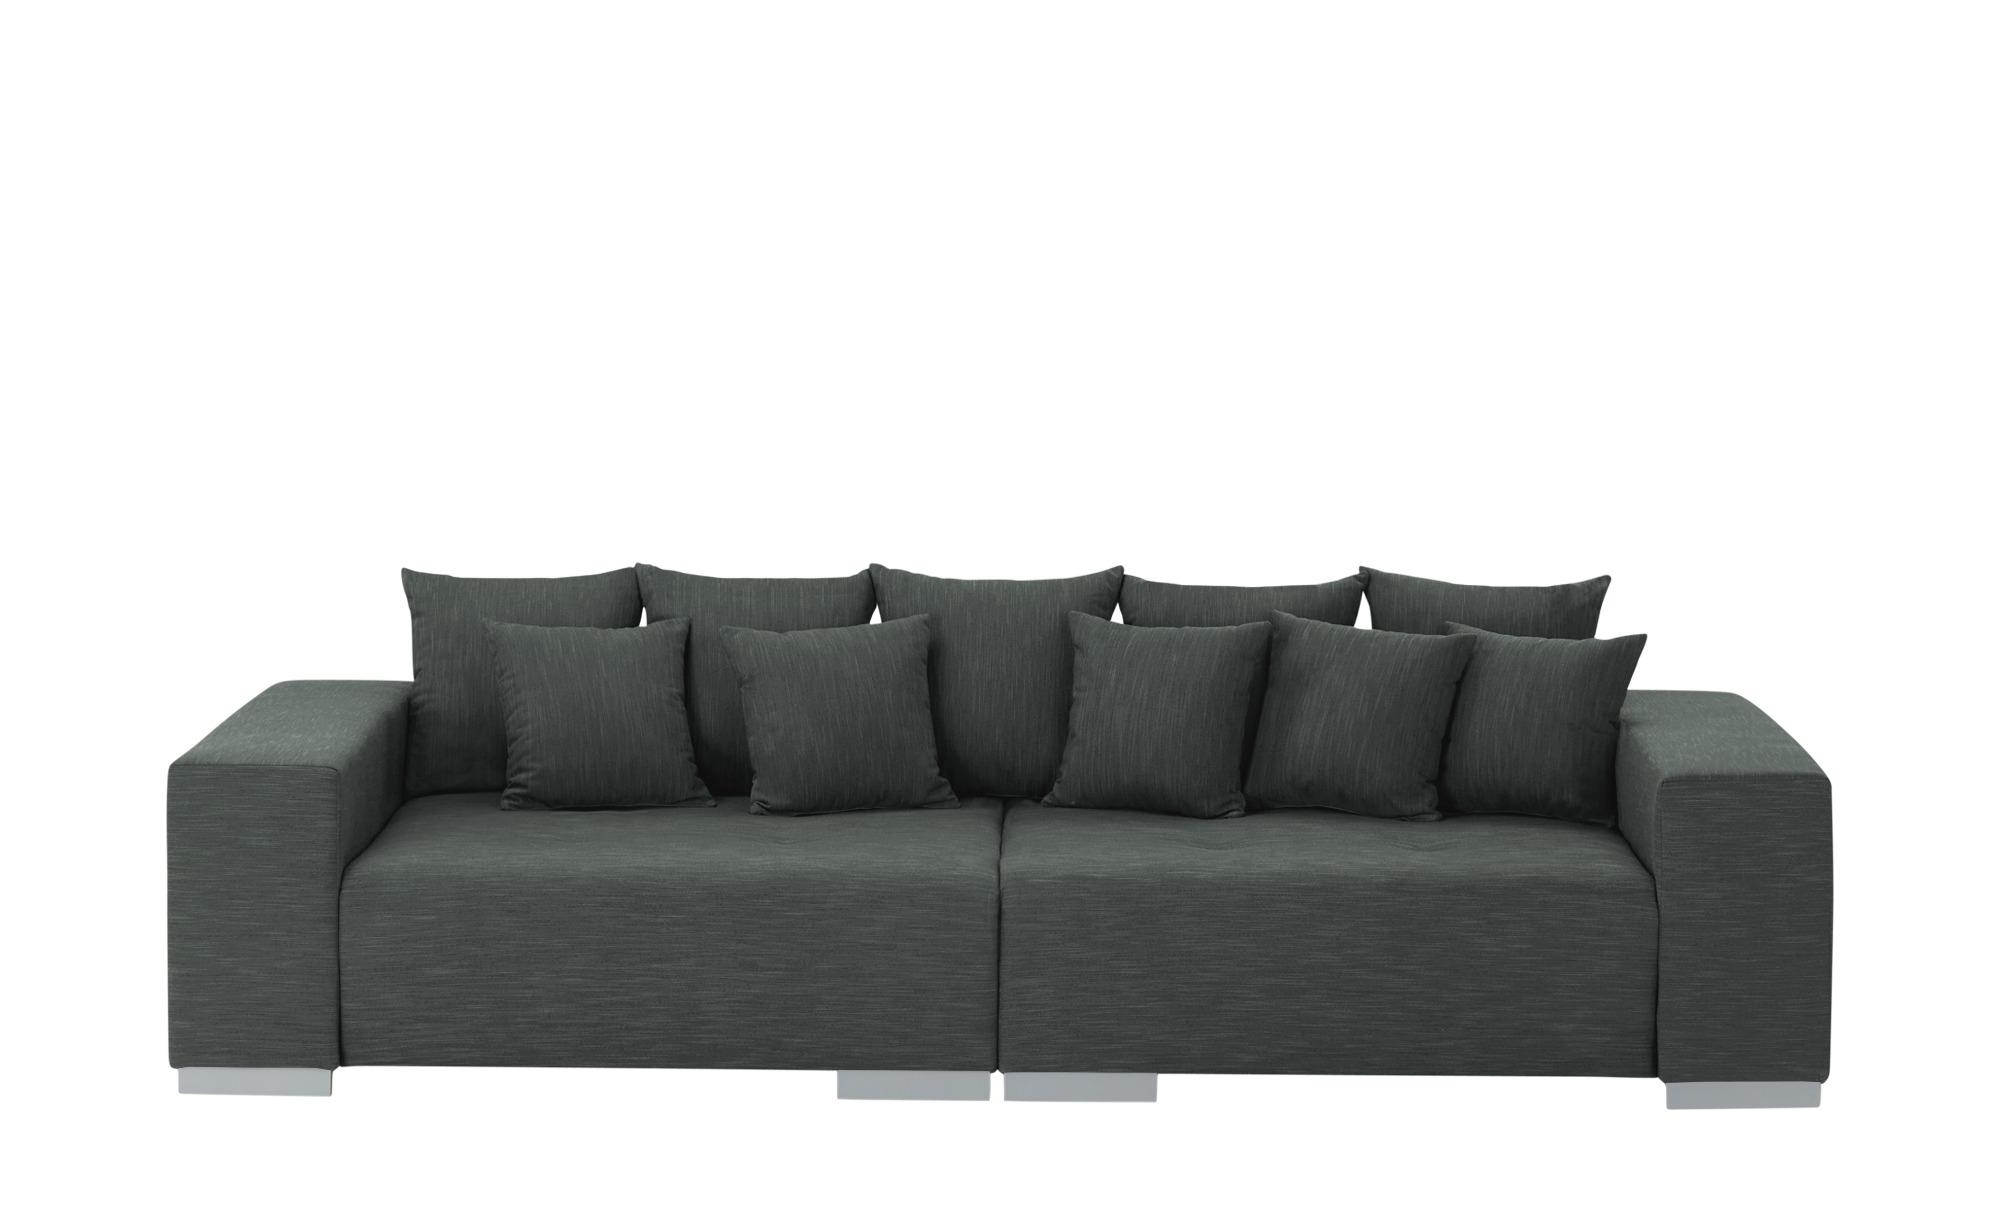 switch Big Sofa  Max ¦ schwarz ¦ Maße (cm): B: 300 H: 85 T: 136 Polstermöbel > Sofas > Big-Sofas - Höffner